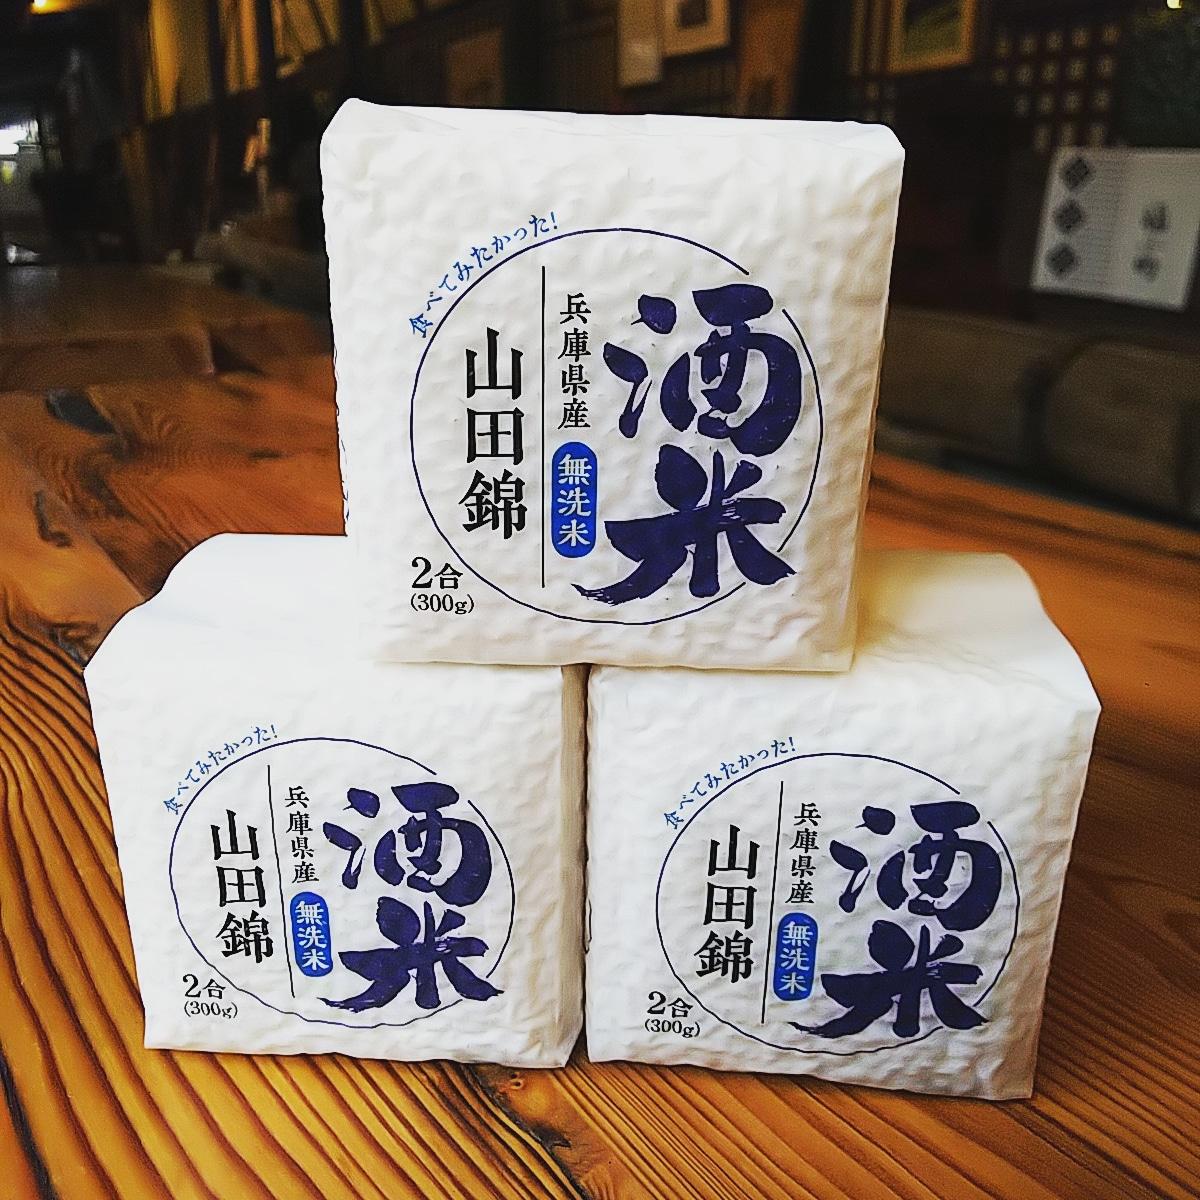 http://www.fukukomachi.com/blog/photo/IMG_20190205_103043_787.jpg